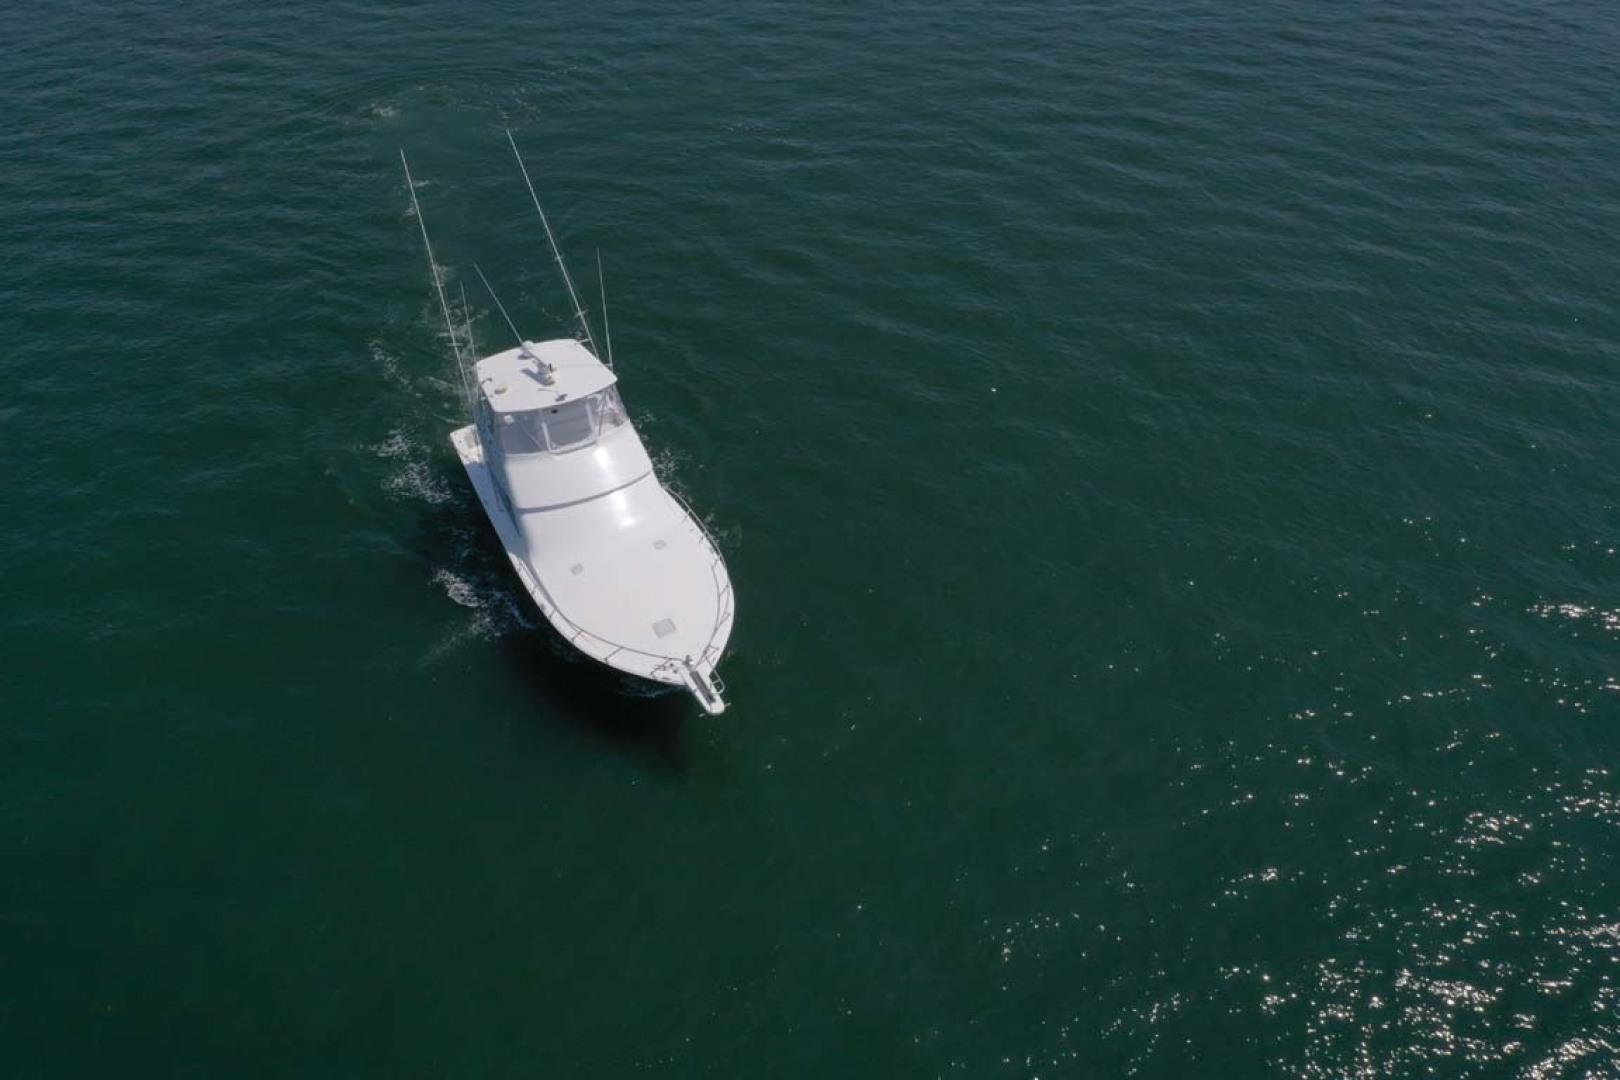 Viking-48 Convertible 2002-Sugaree PALM BEACH-Florida-United States-Overview-1348619 | Thumbnail